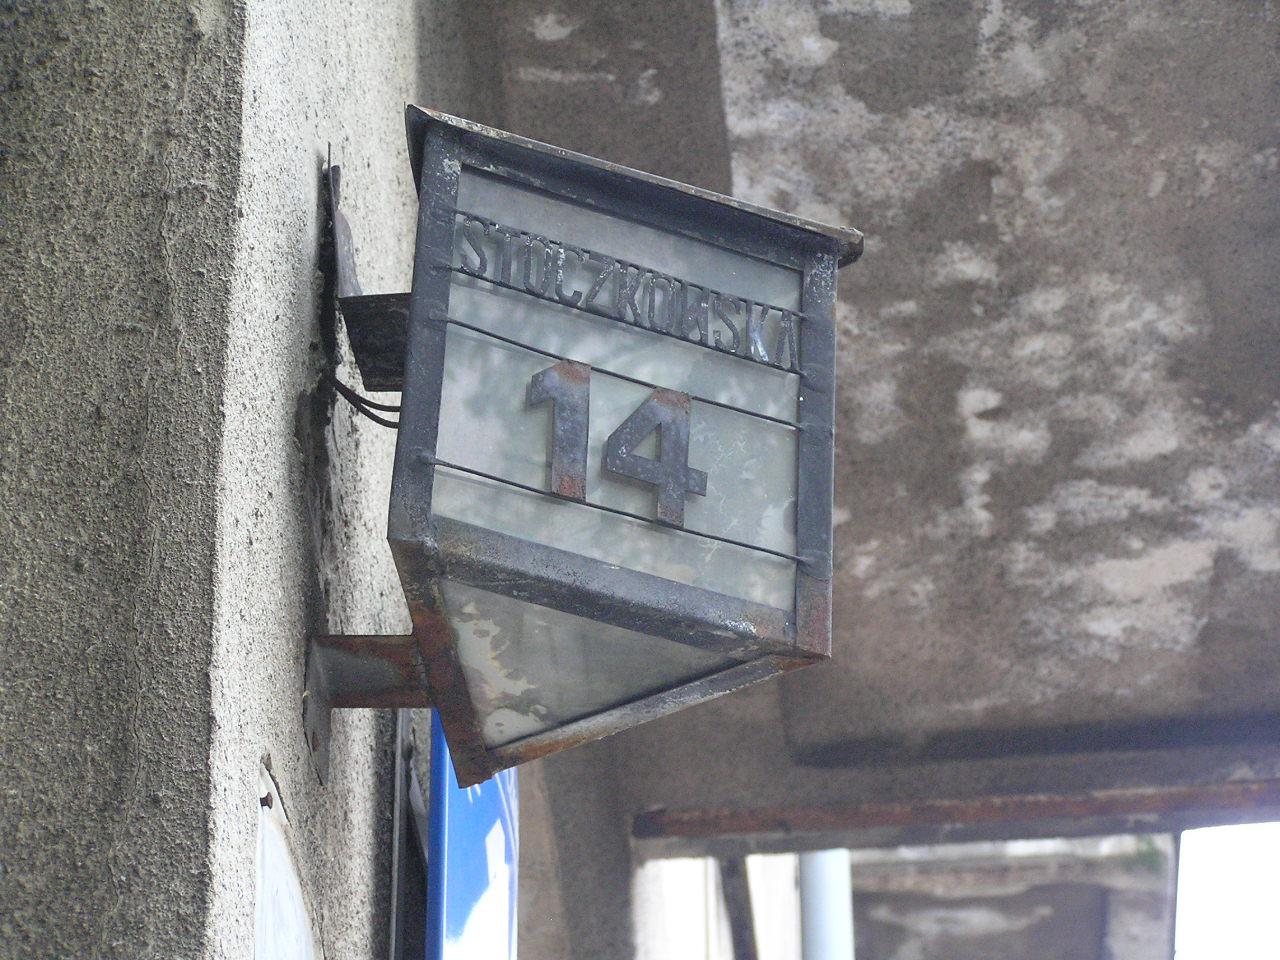 Latarenka adresowa - Stoczkowska 14